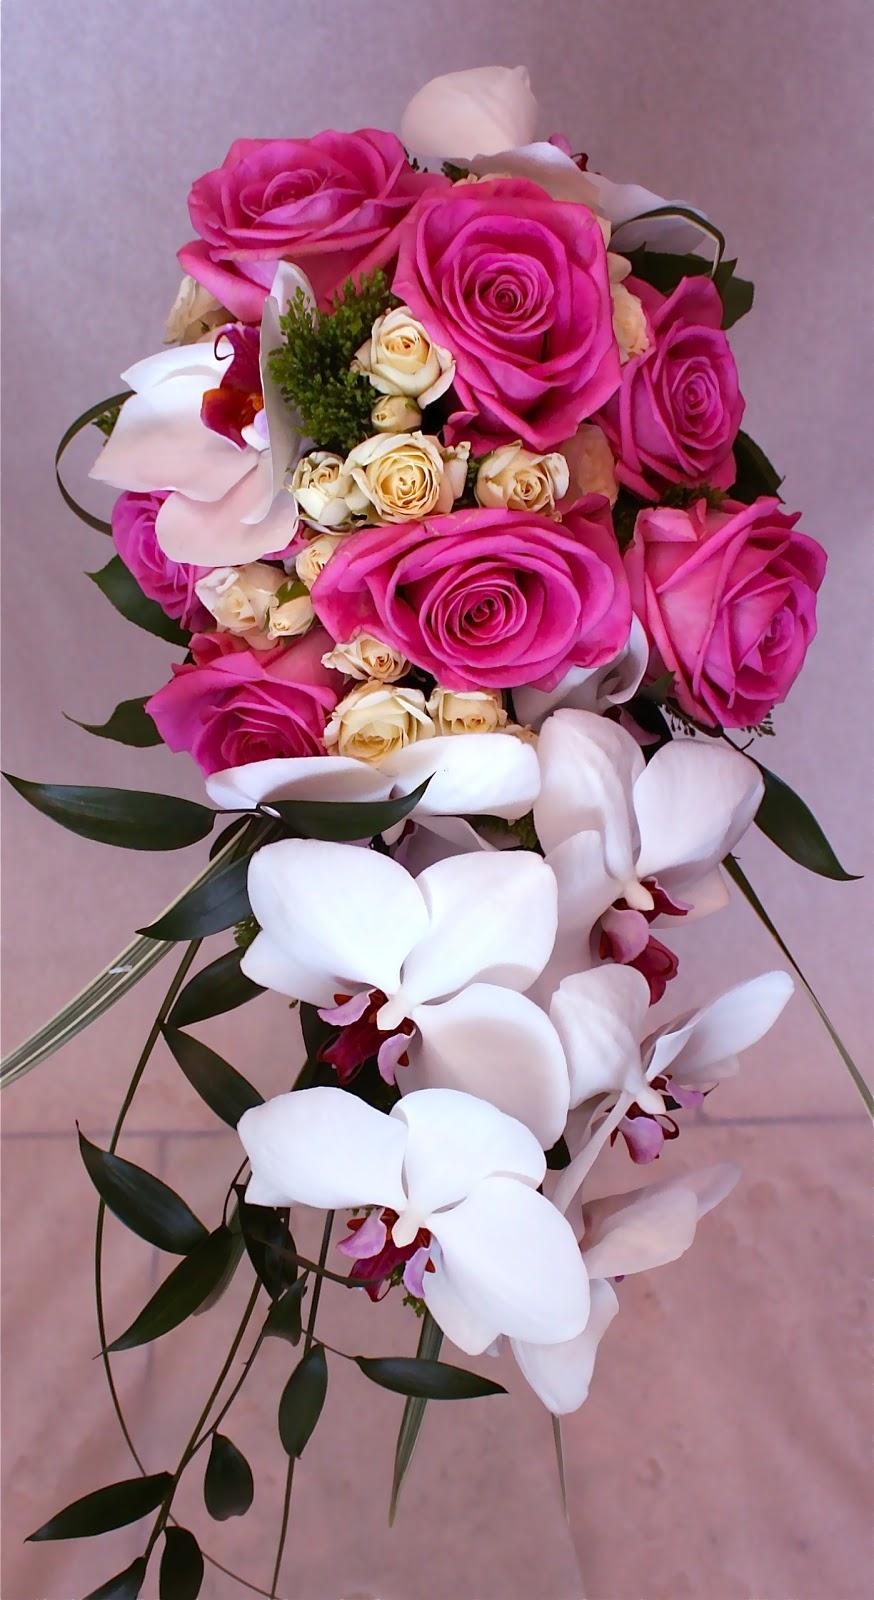 Premium Flowers: The Cascade Wedding Bouquet